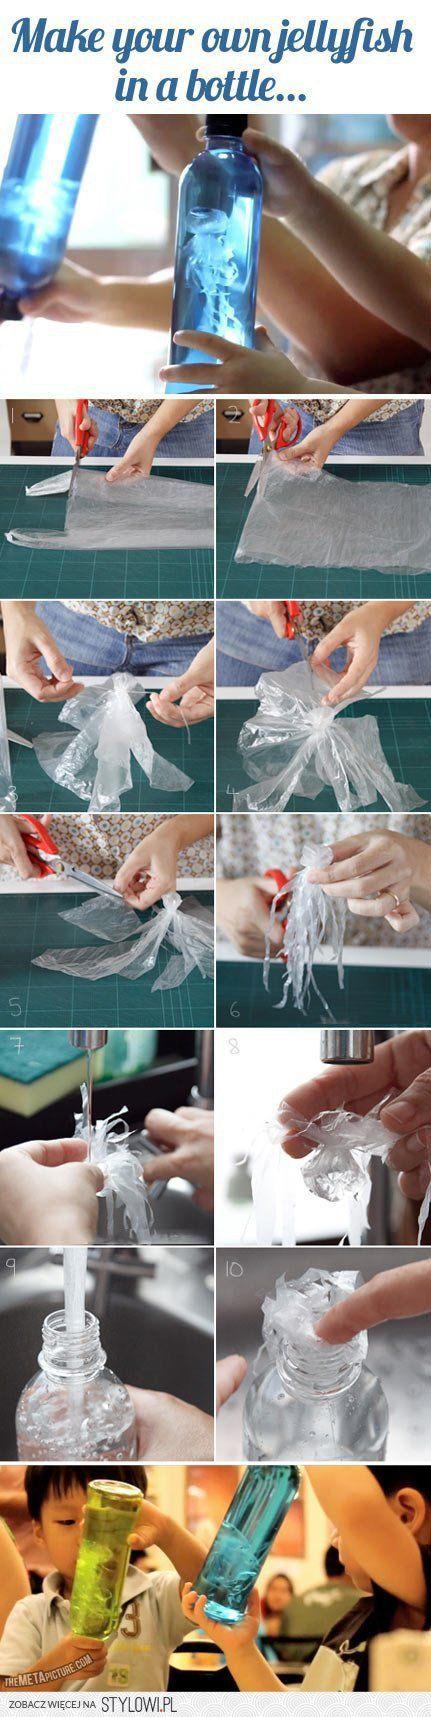 DIY Homemade plastic jellyfish!